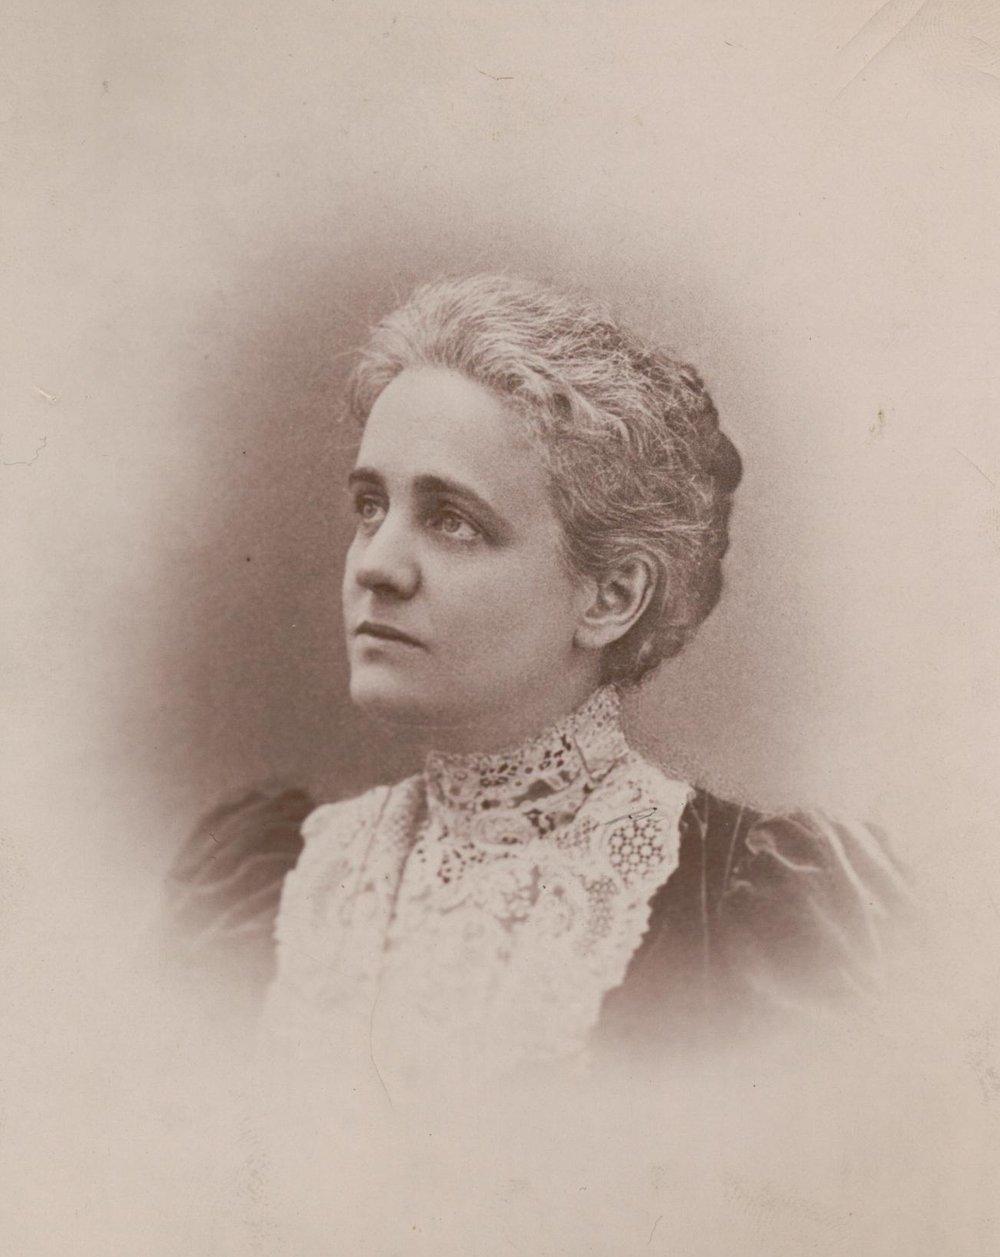 Martha Foote Crow